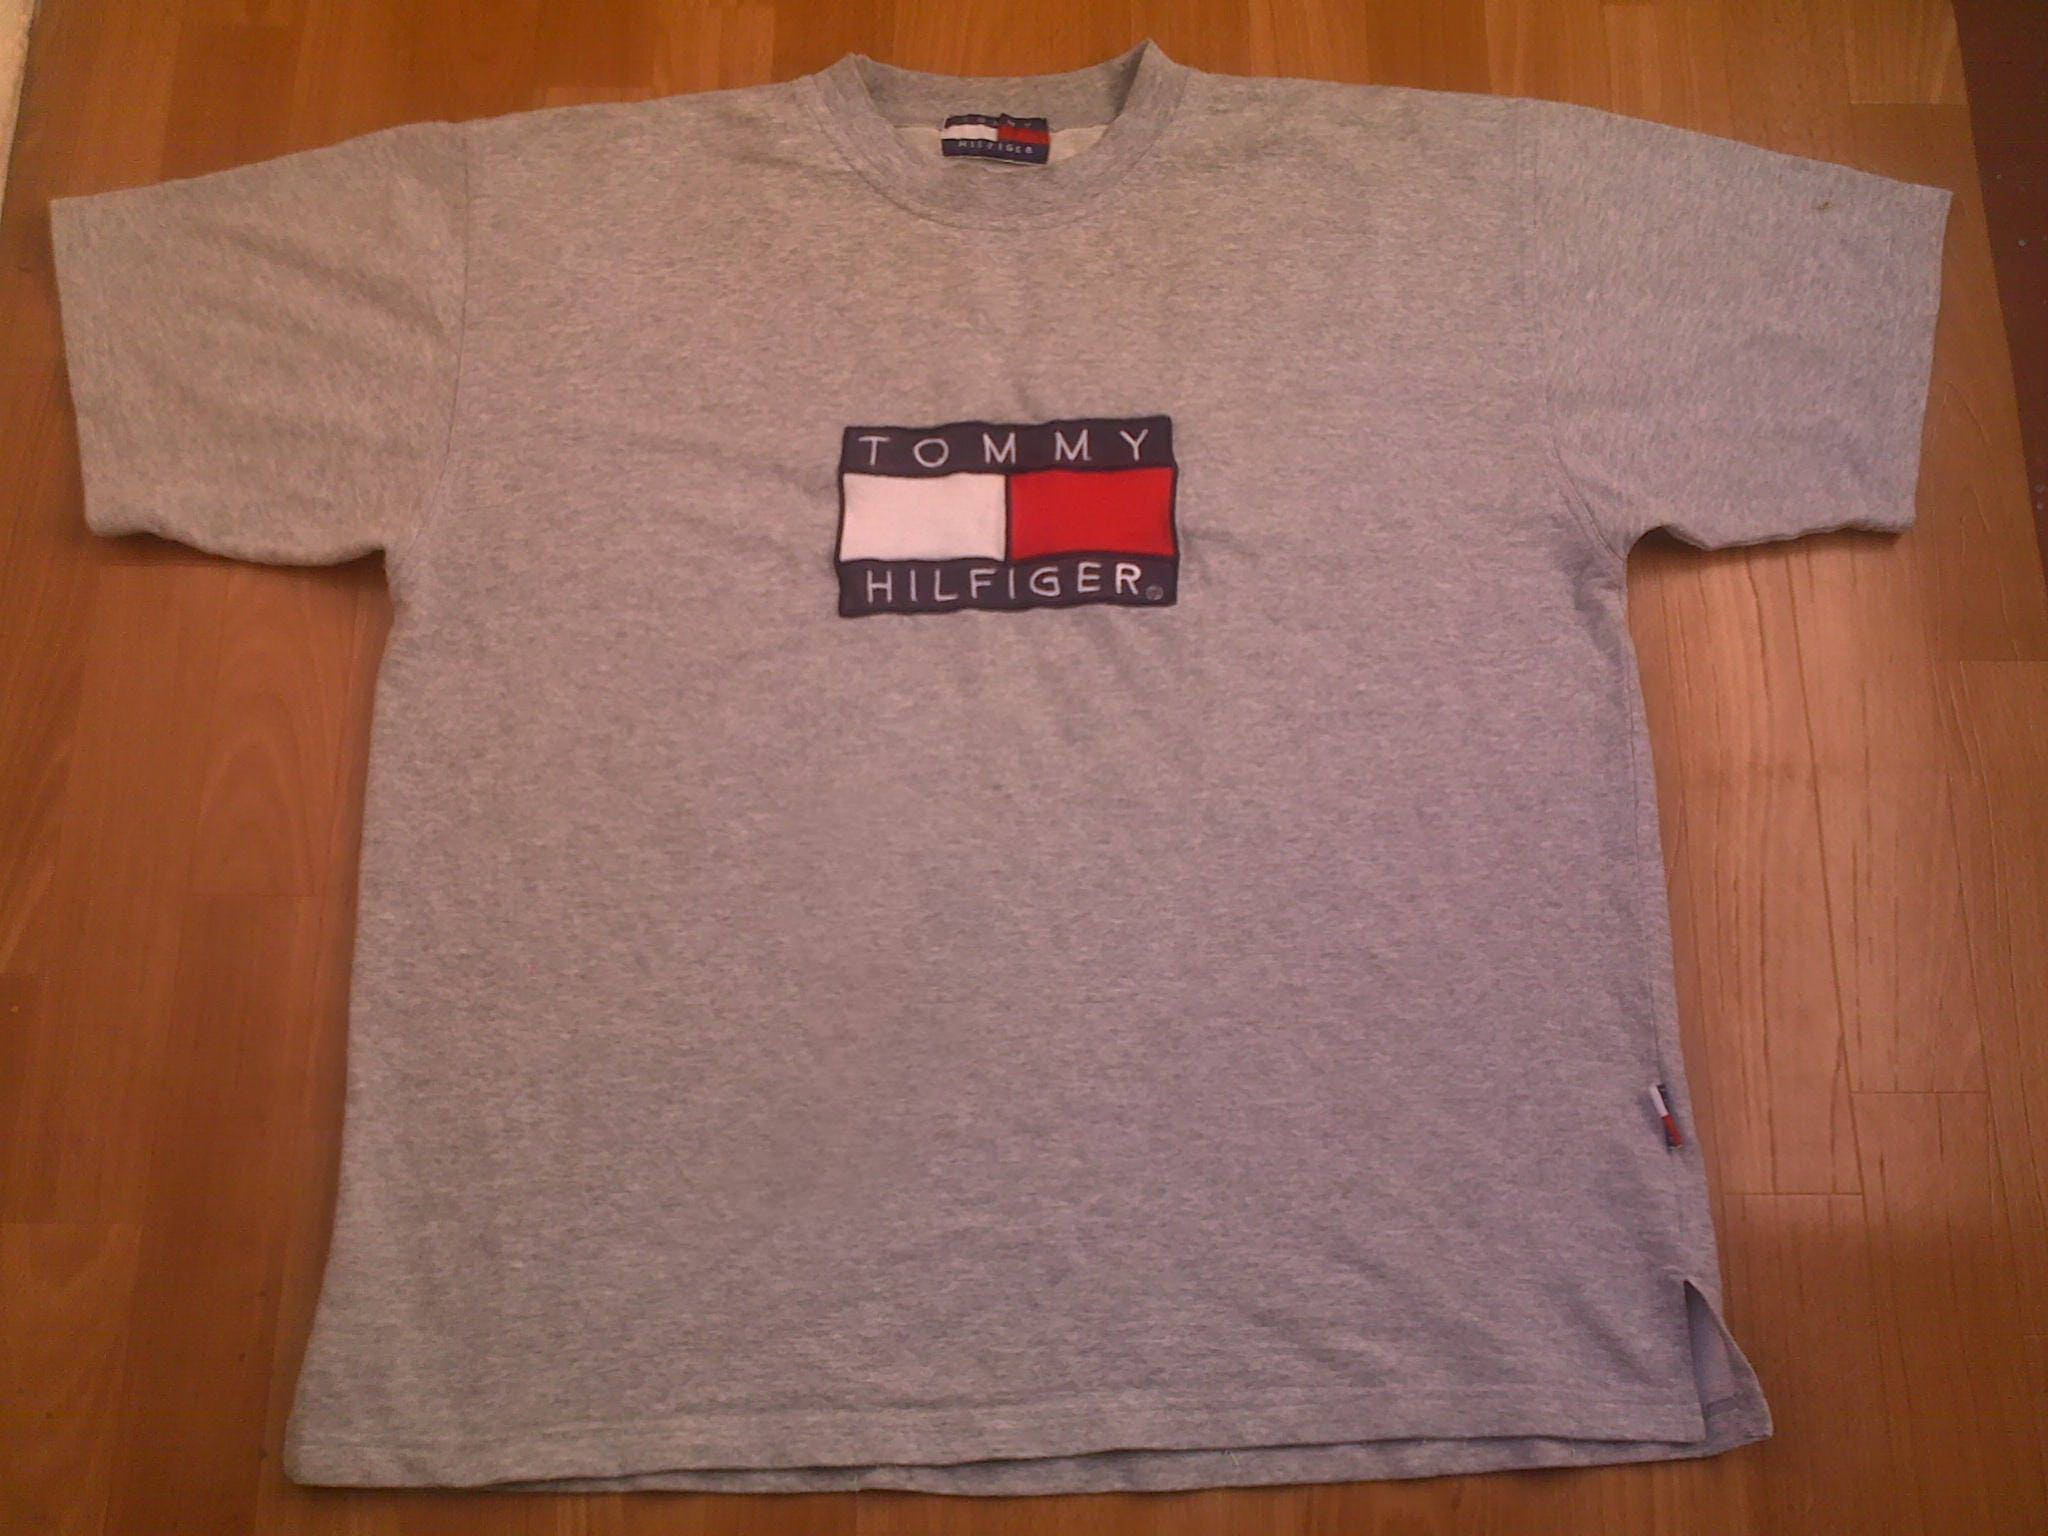 old tommy hilfiger shirts